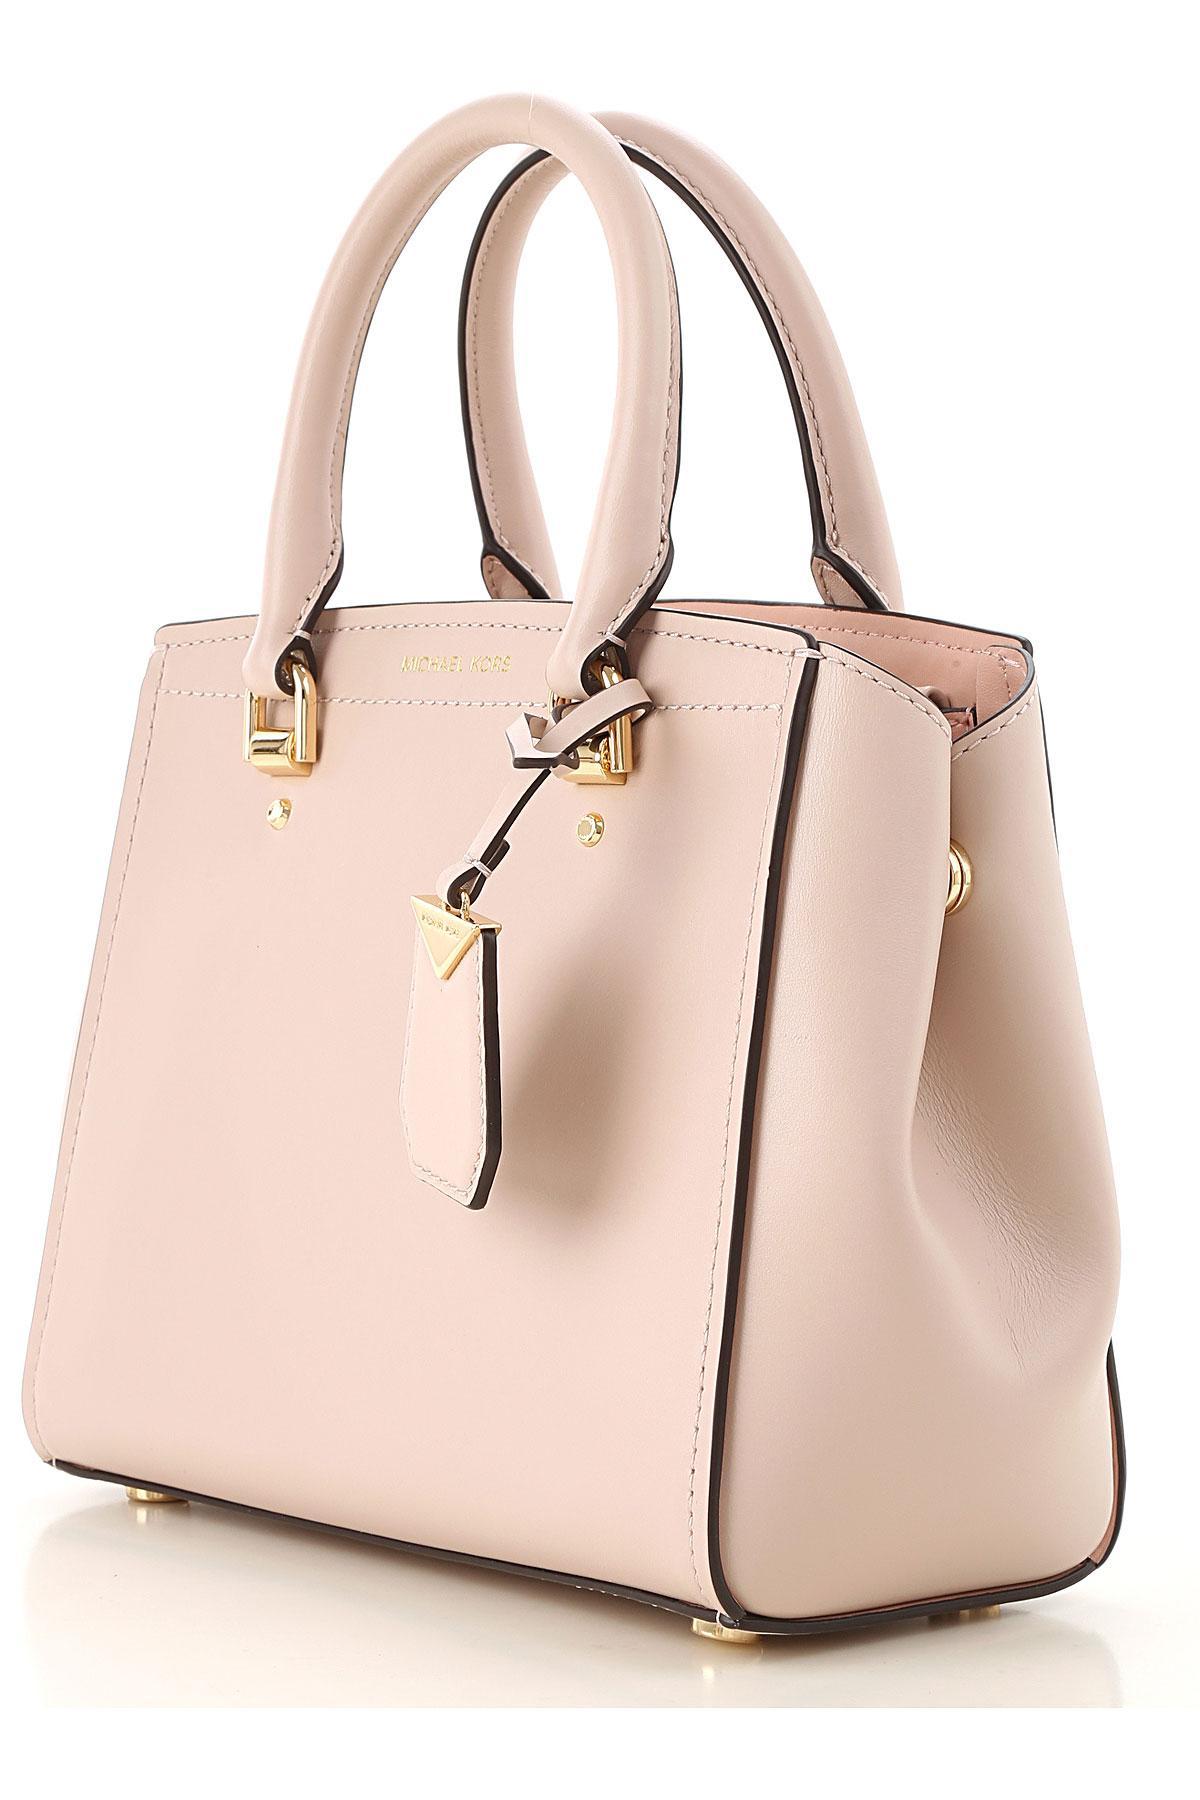 8c9eec5bc91a Michael Kors - Pink Tote Bag - Lyst. View fullscreen